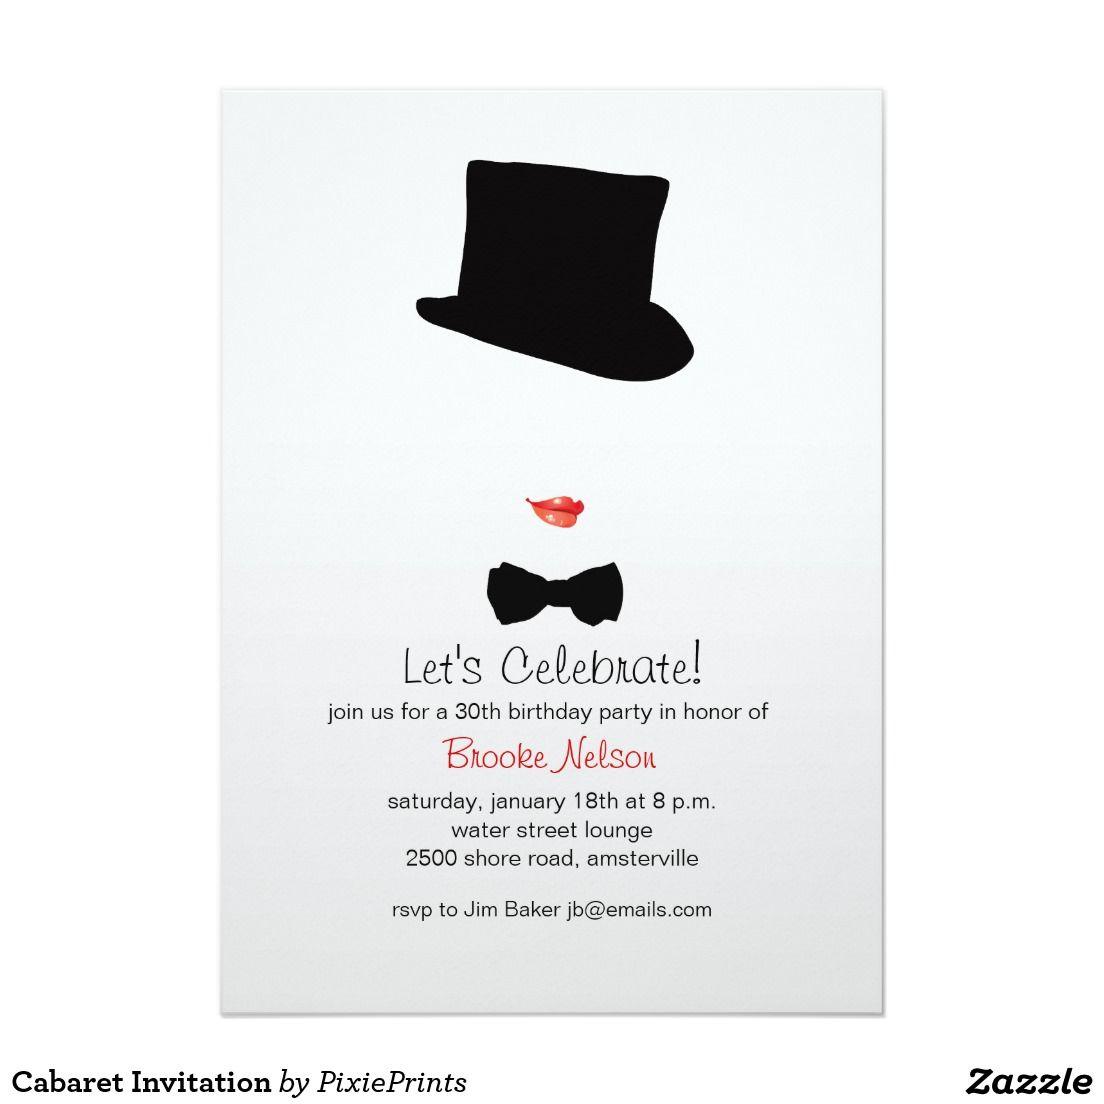 Cabaret Invitation   Cabaret, Bachelorette parties and Invitation ...